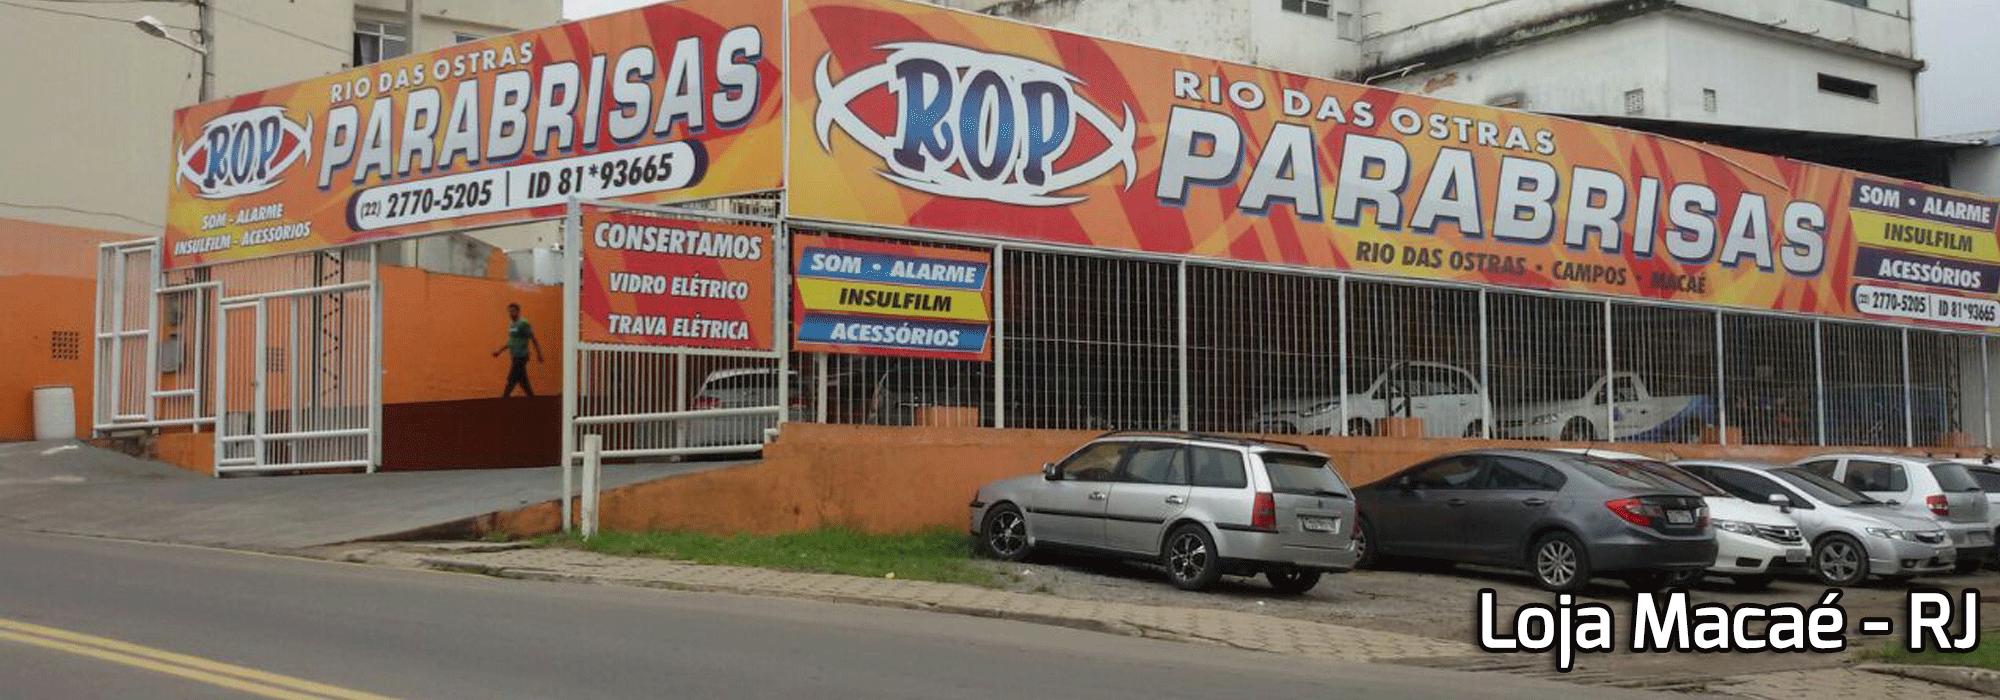 Fernando Armario Muñoz ~ Rio das Ostras Parabrisas Rio das Ostras, Macaé e Campos